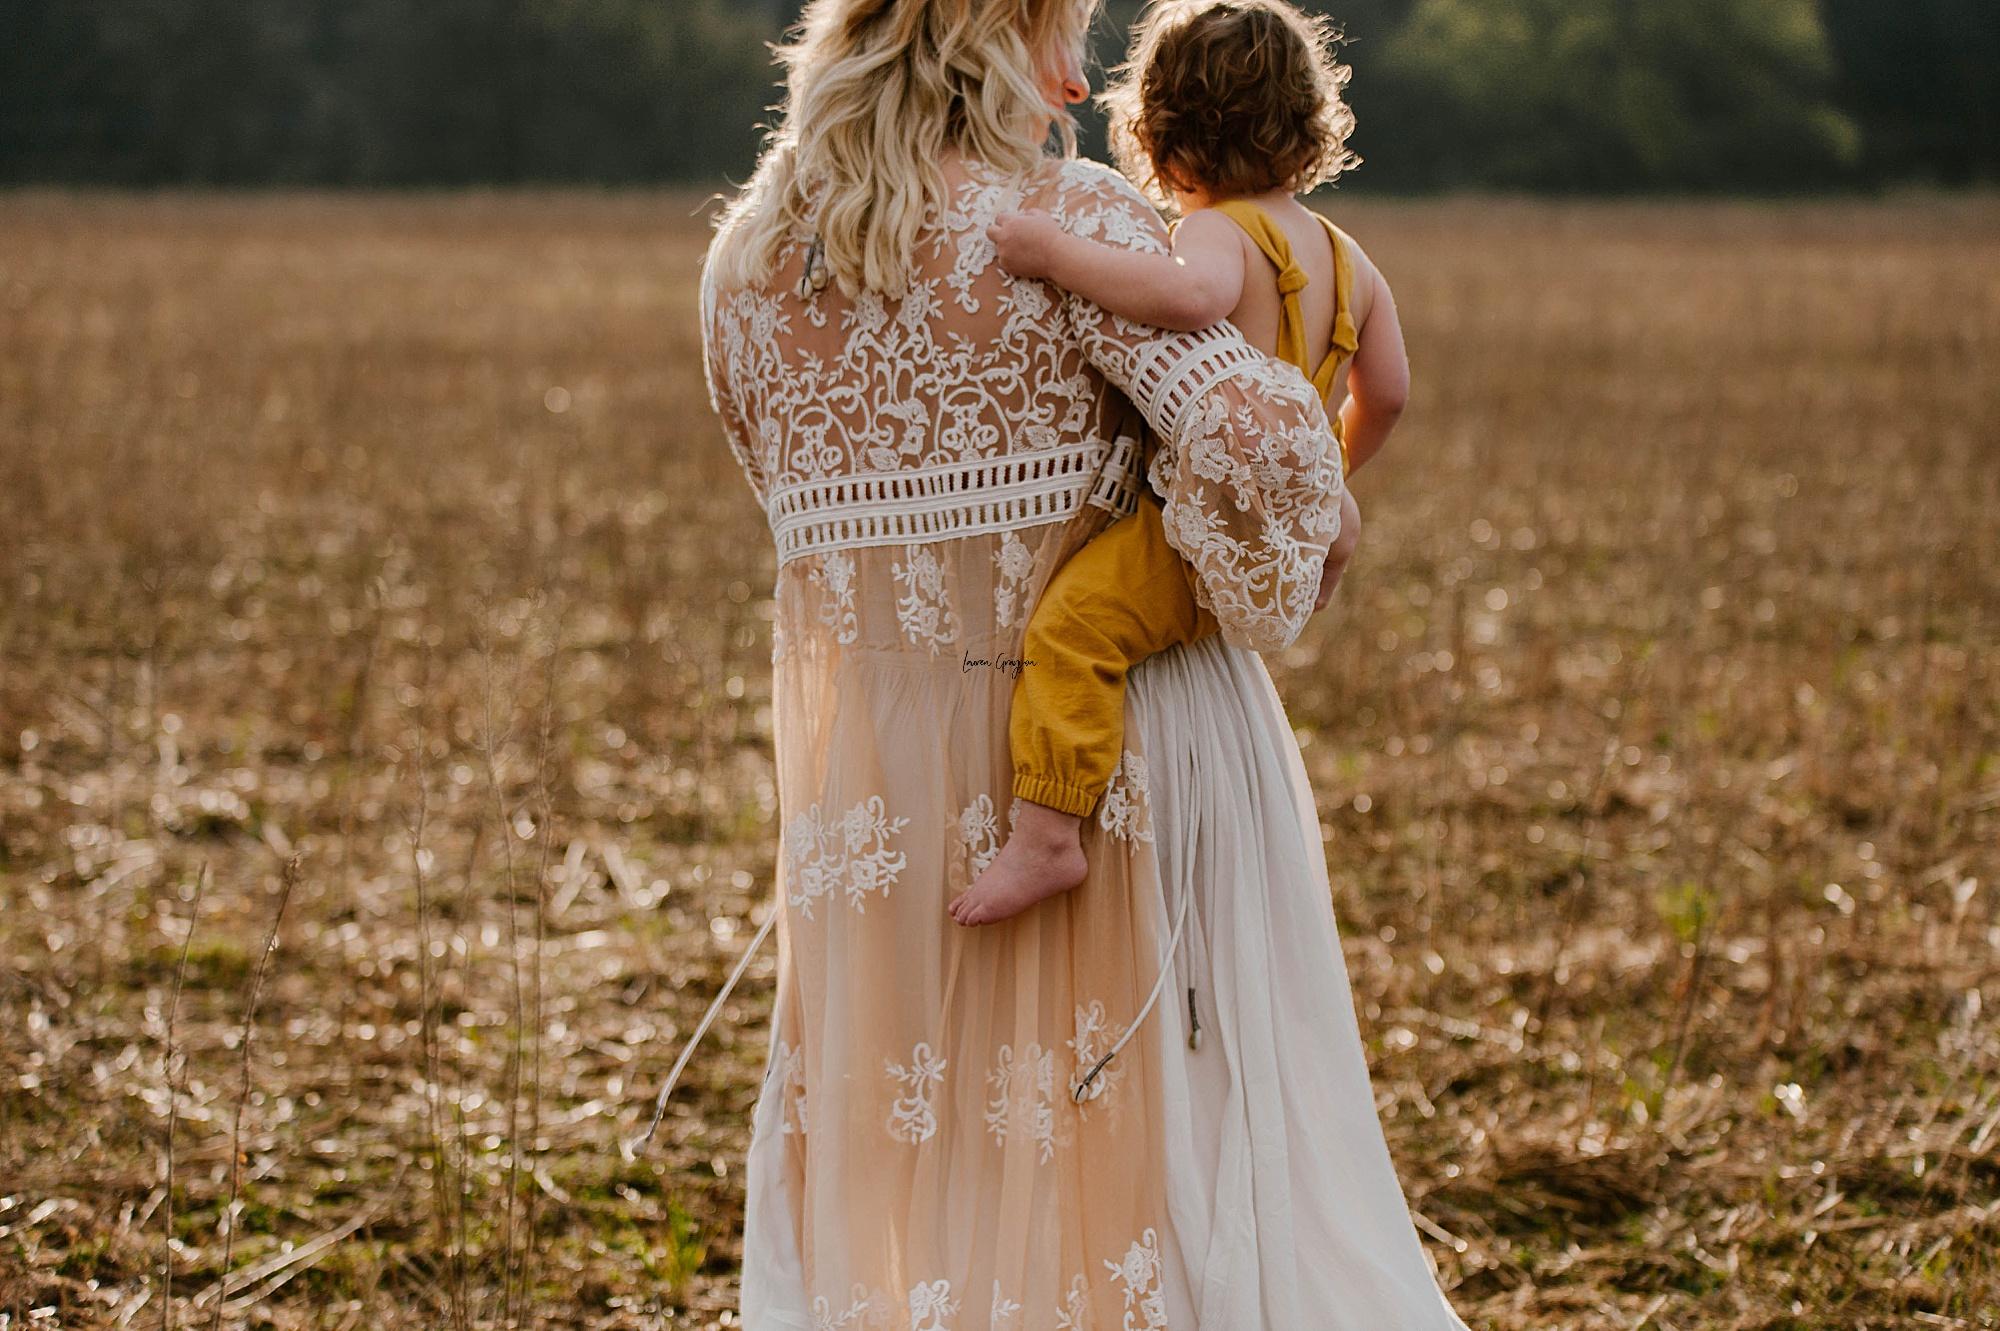 lauren-grayson-photography-akron-ohio-family-mom-boys-field-spring-outdoor-session_0020.jpg